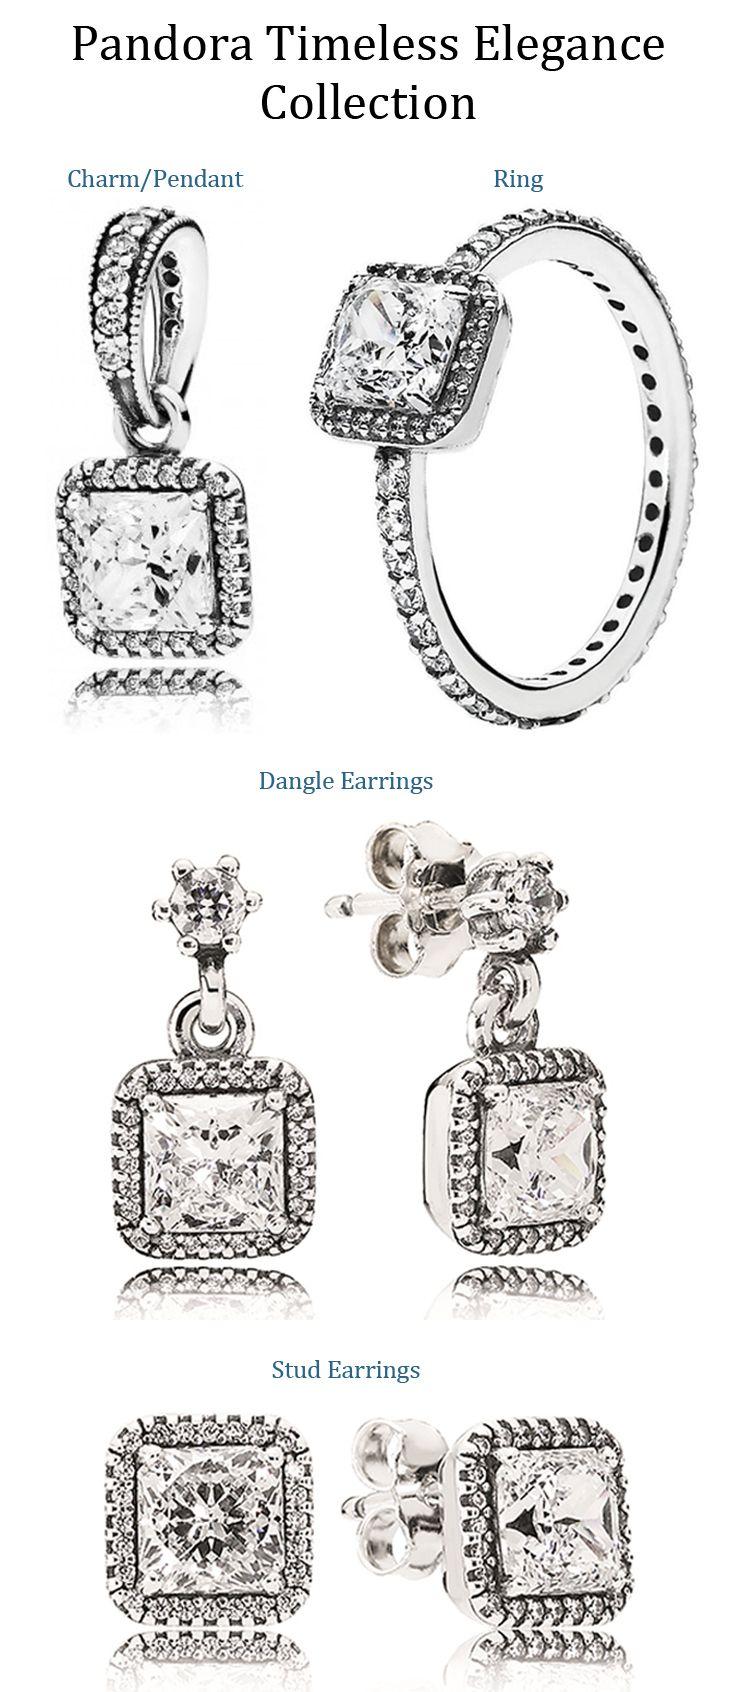 pandora timeless elegance collection available at exclusively diamonds pandora en 2018. Black Bedroom Furniture Sets. Home Design Ideas